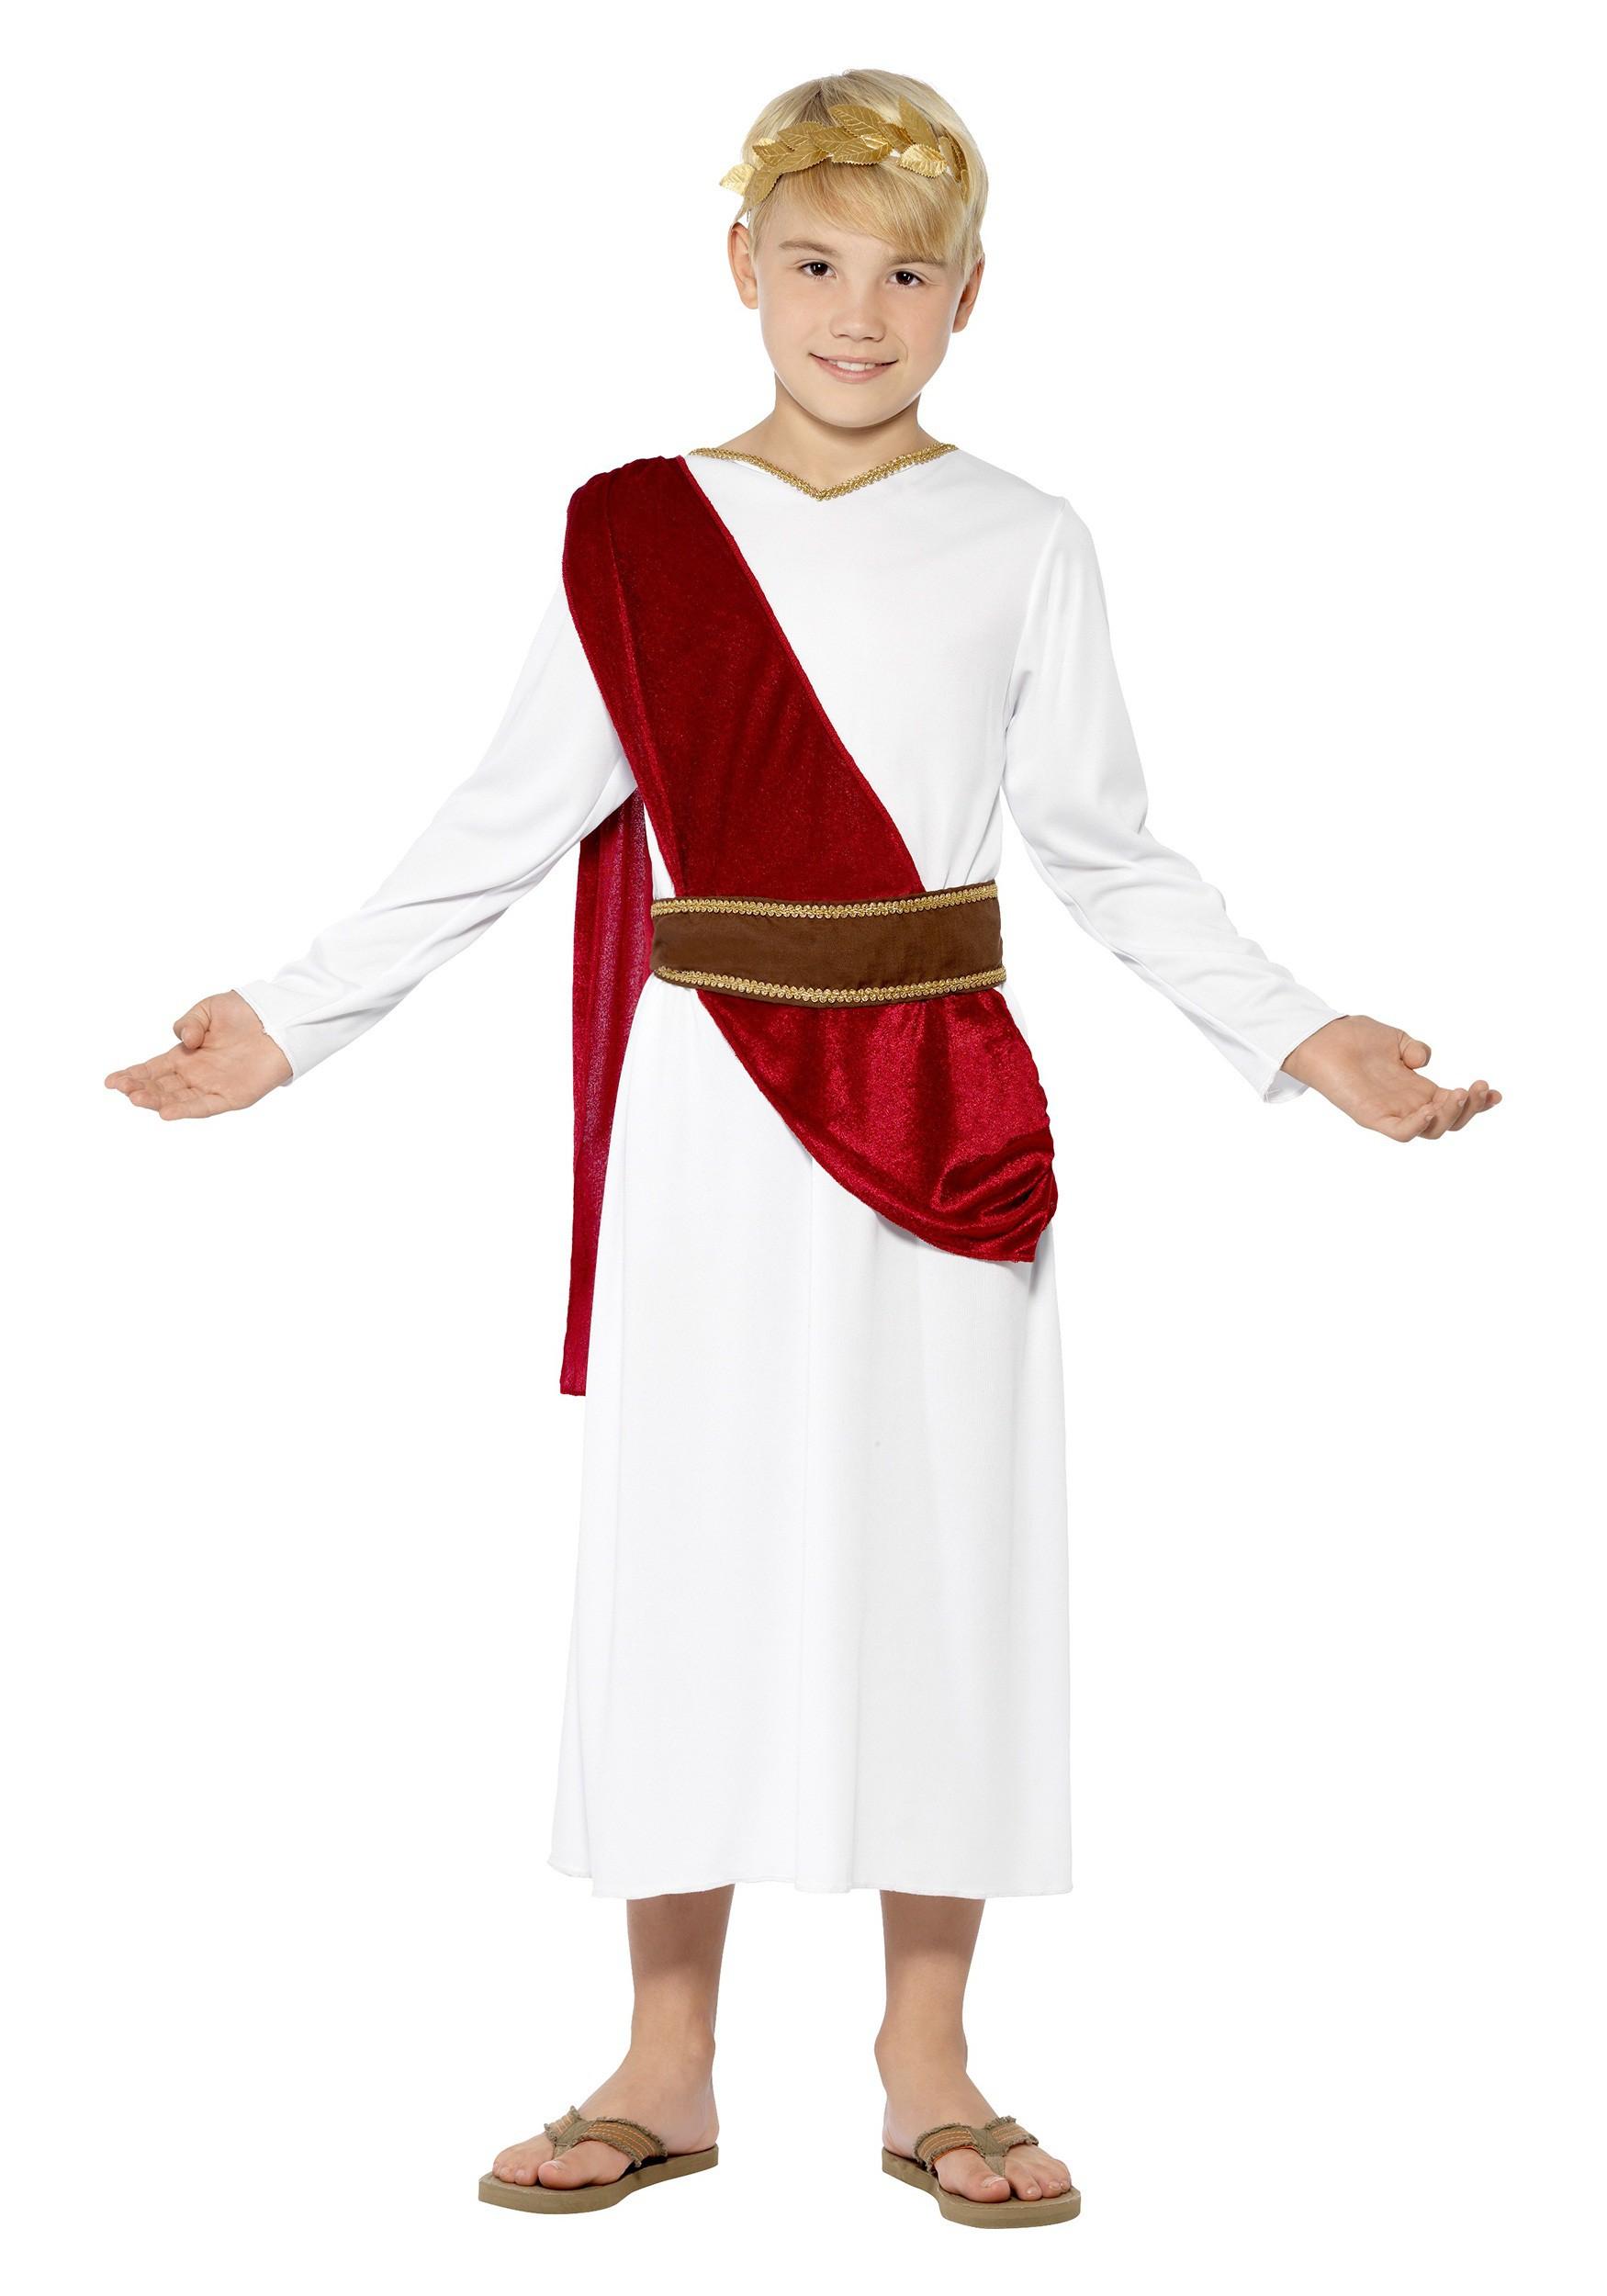 Halloween Costumes For Kids Kids Costumes Halloween Costumes